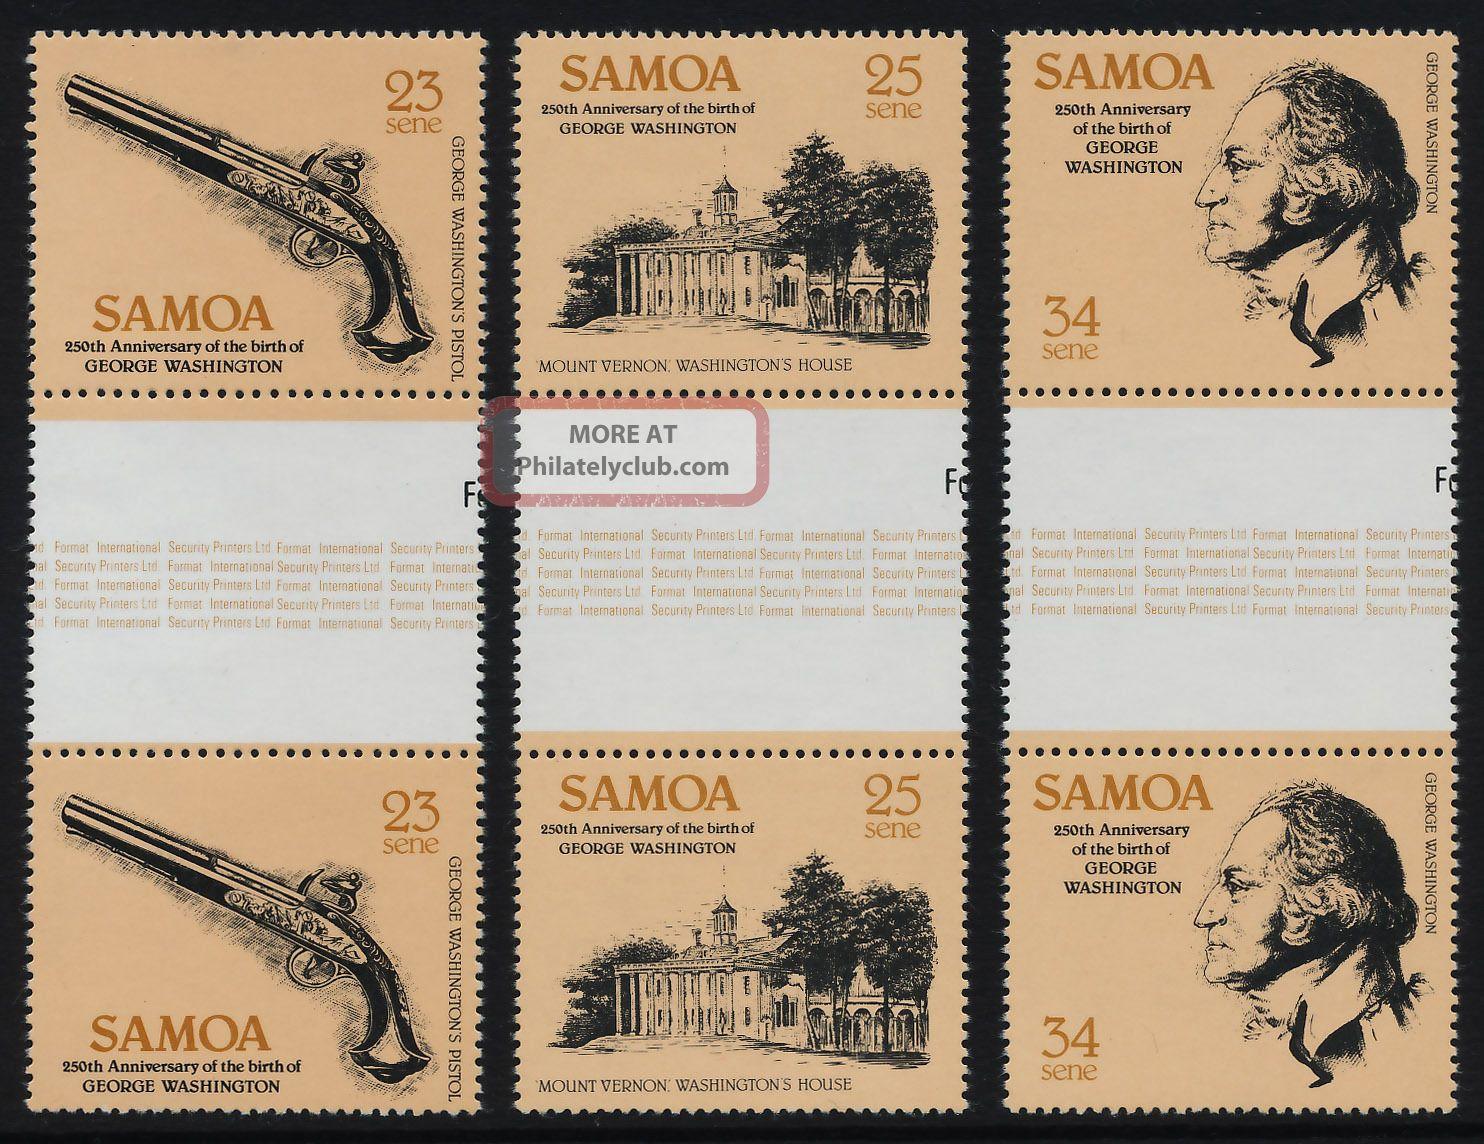 Samoa 567 - 9 Gutter Pairs George Washington,  Gun,  Weapon,  Mt Vernon British Colonies & Territories photo